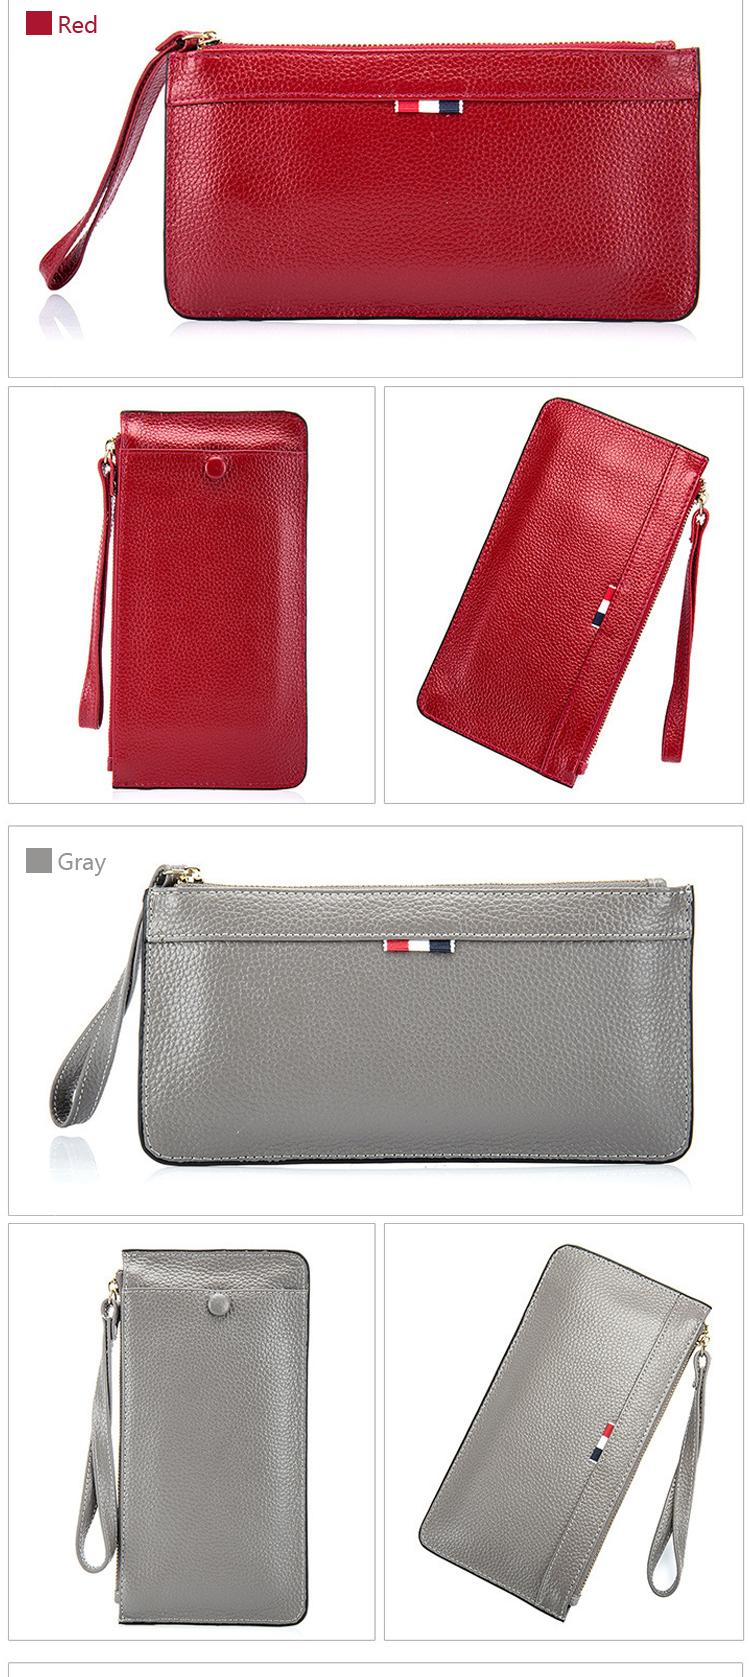 woman-handbag1_02